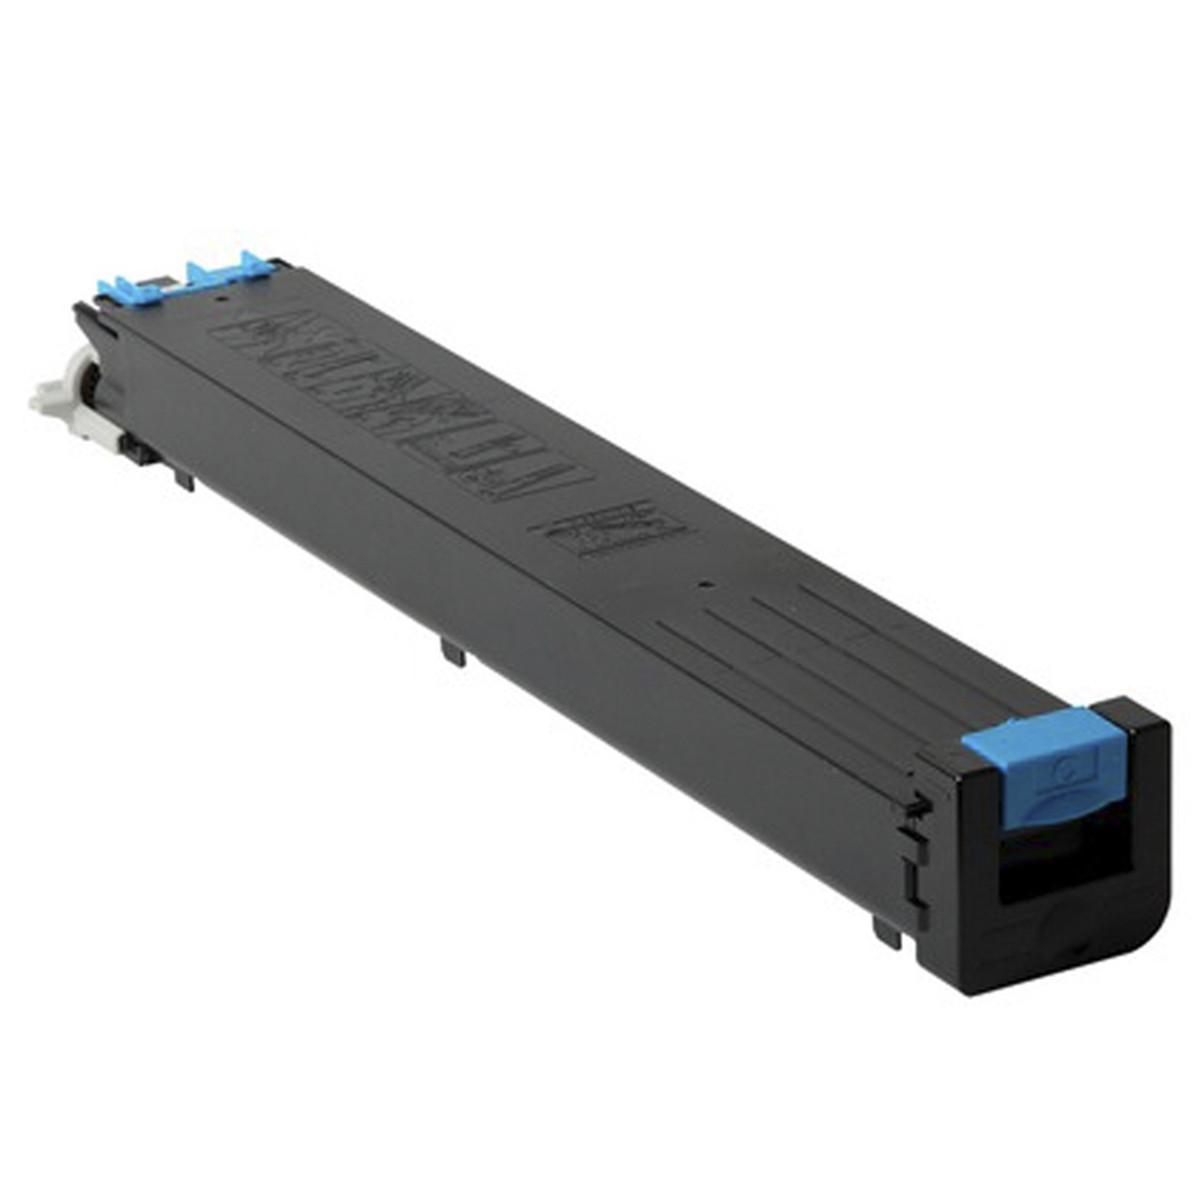 Toner Sharp MX-51BTCA MX-51NTCA Ciano | MX4110 MX4111 MX5110 MX5111 | Katun Business Color 340g